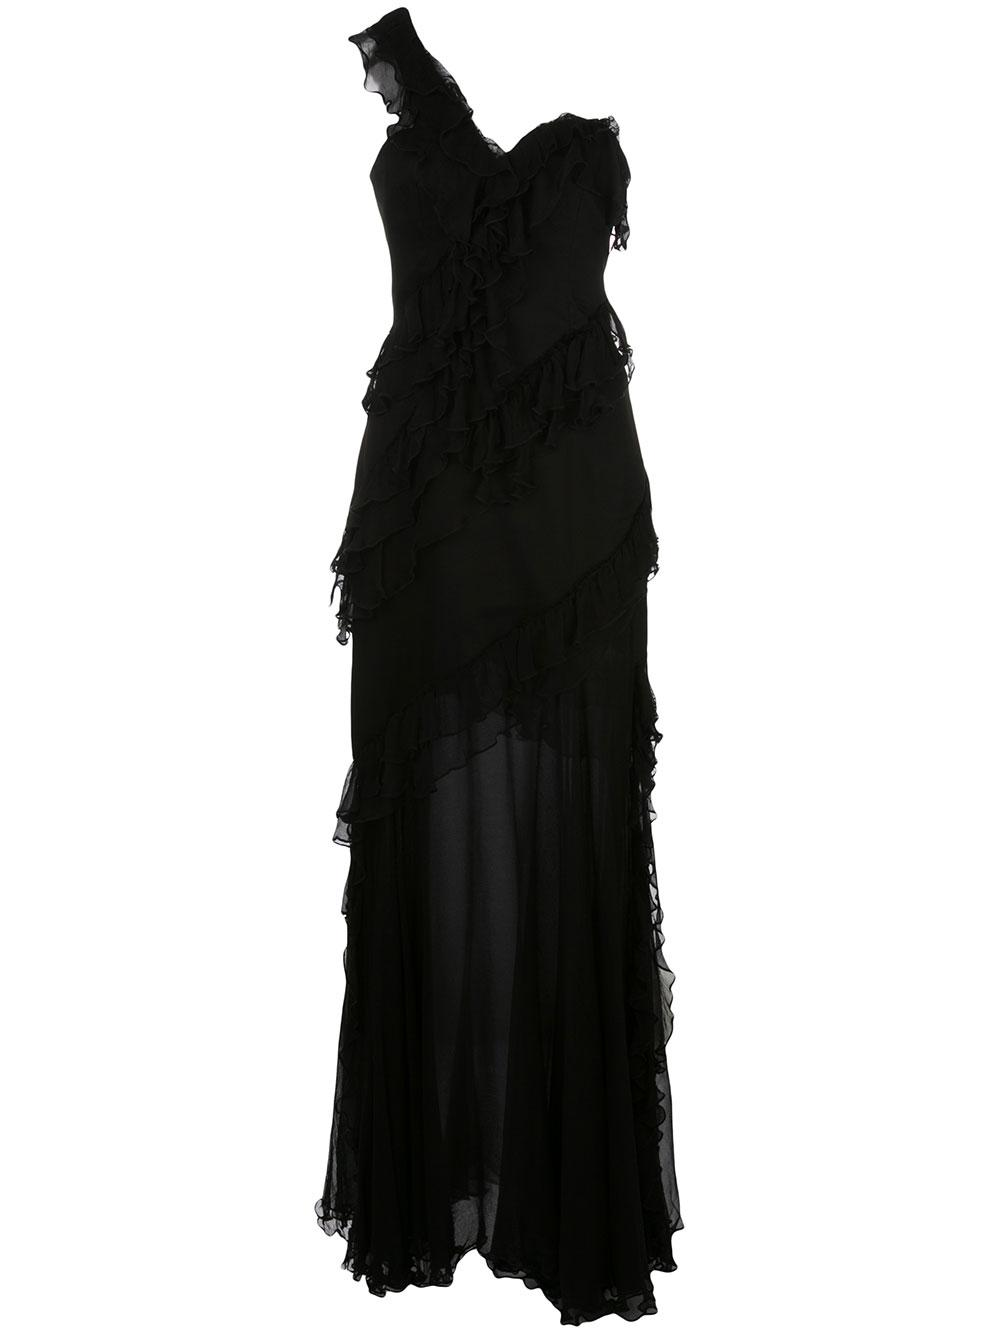 Harlow One Shoulder Sheer Skirt Dress